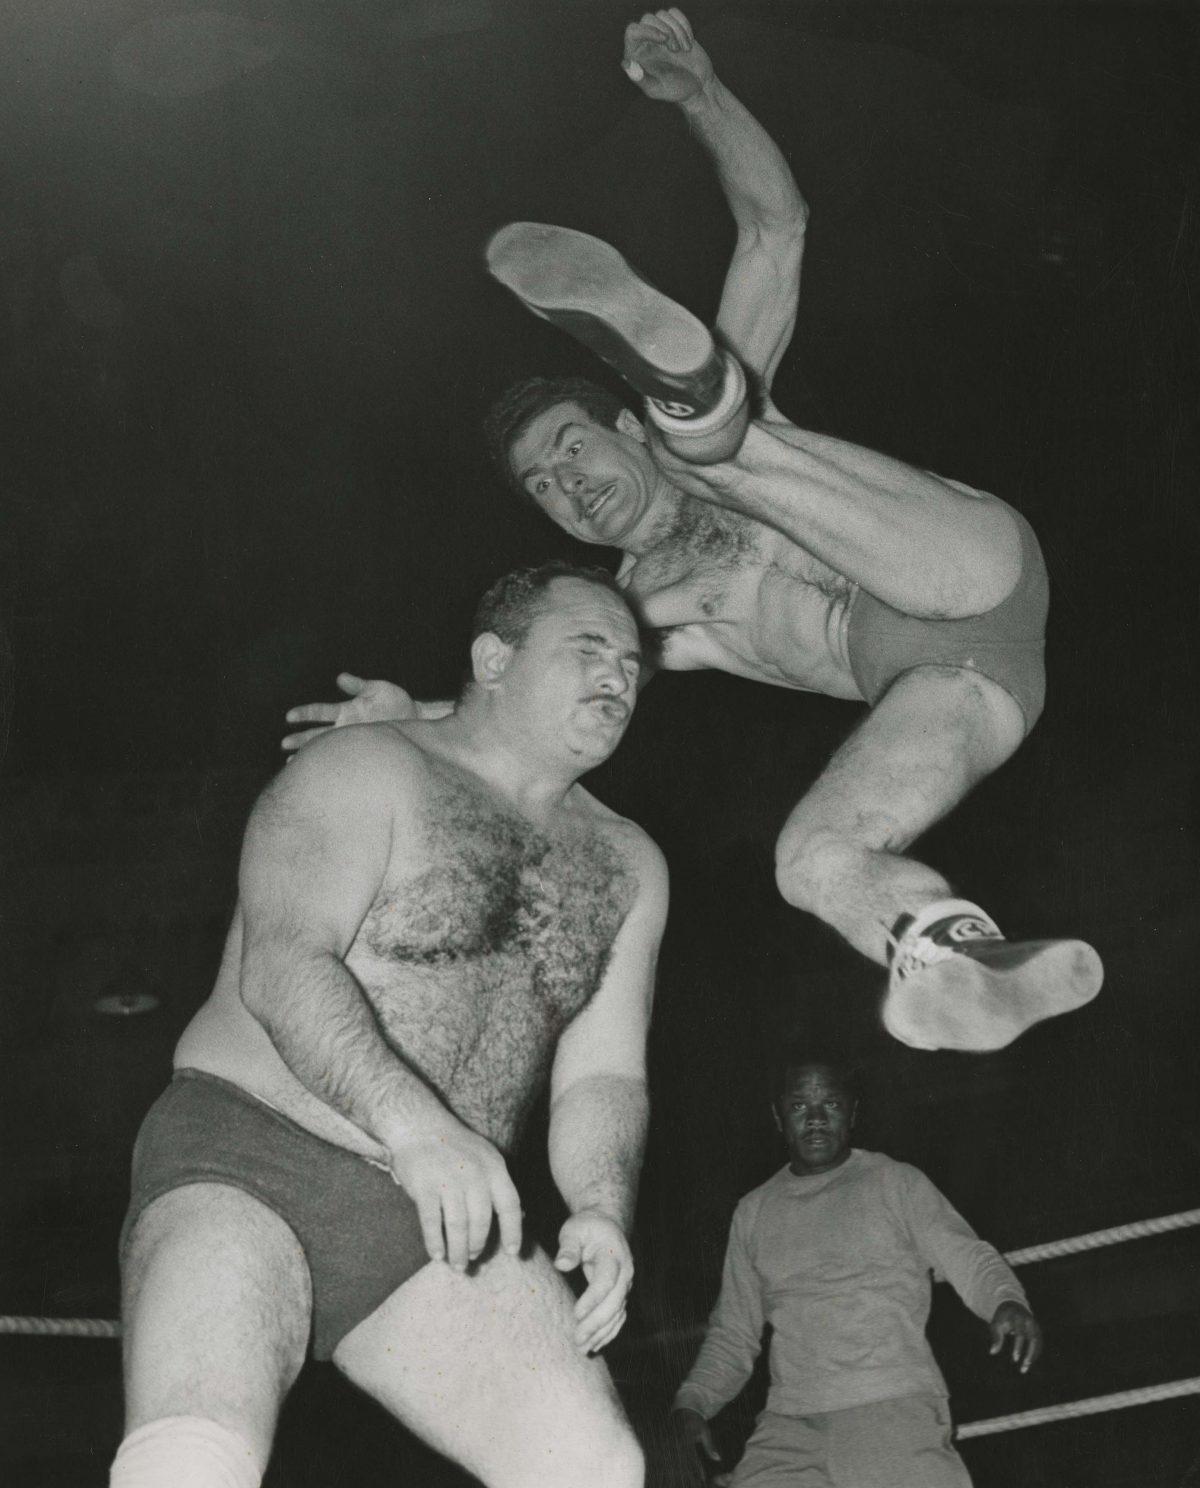 Two Wrestlers, Bogota, 1956. Silver print. Copyright Manuel H.